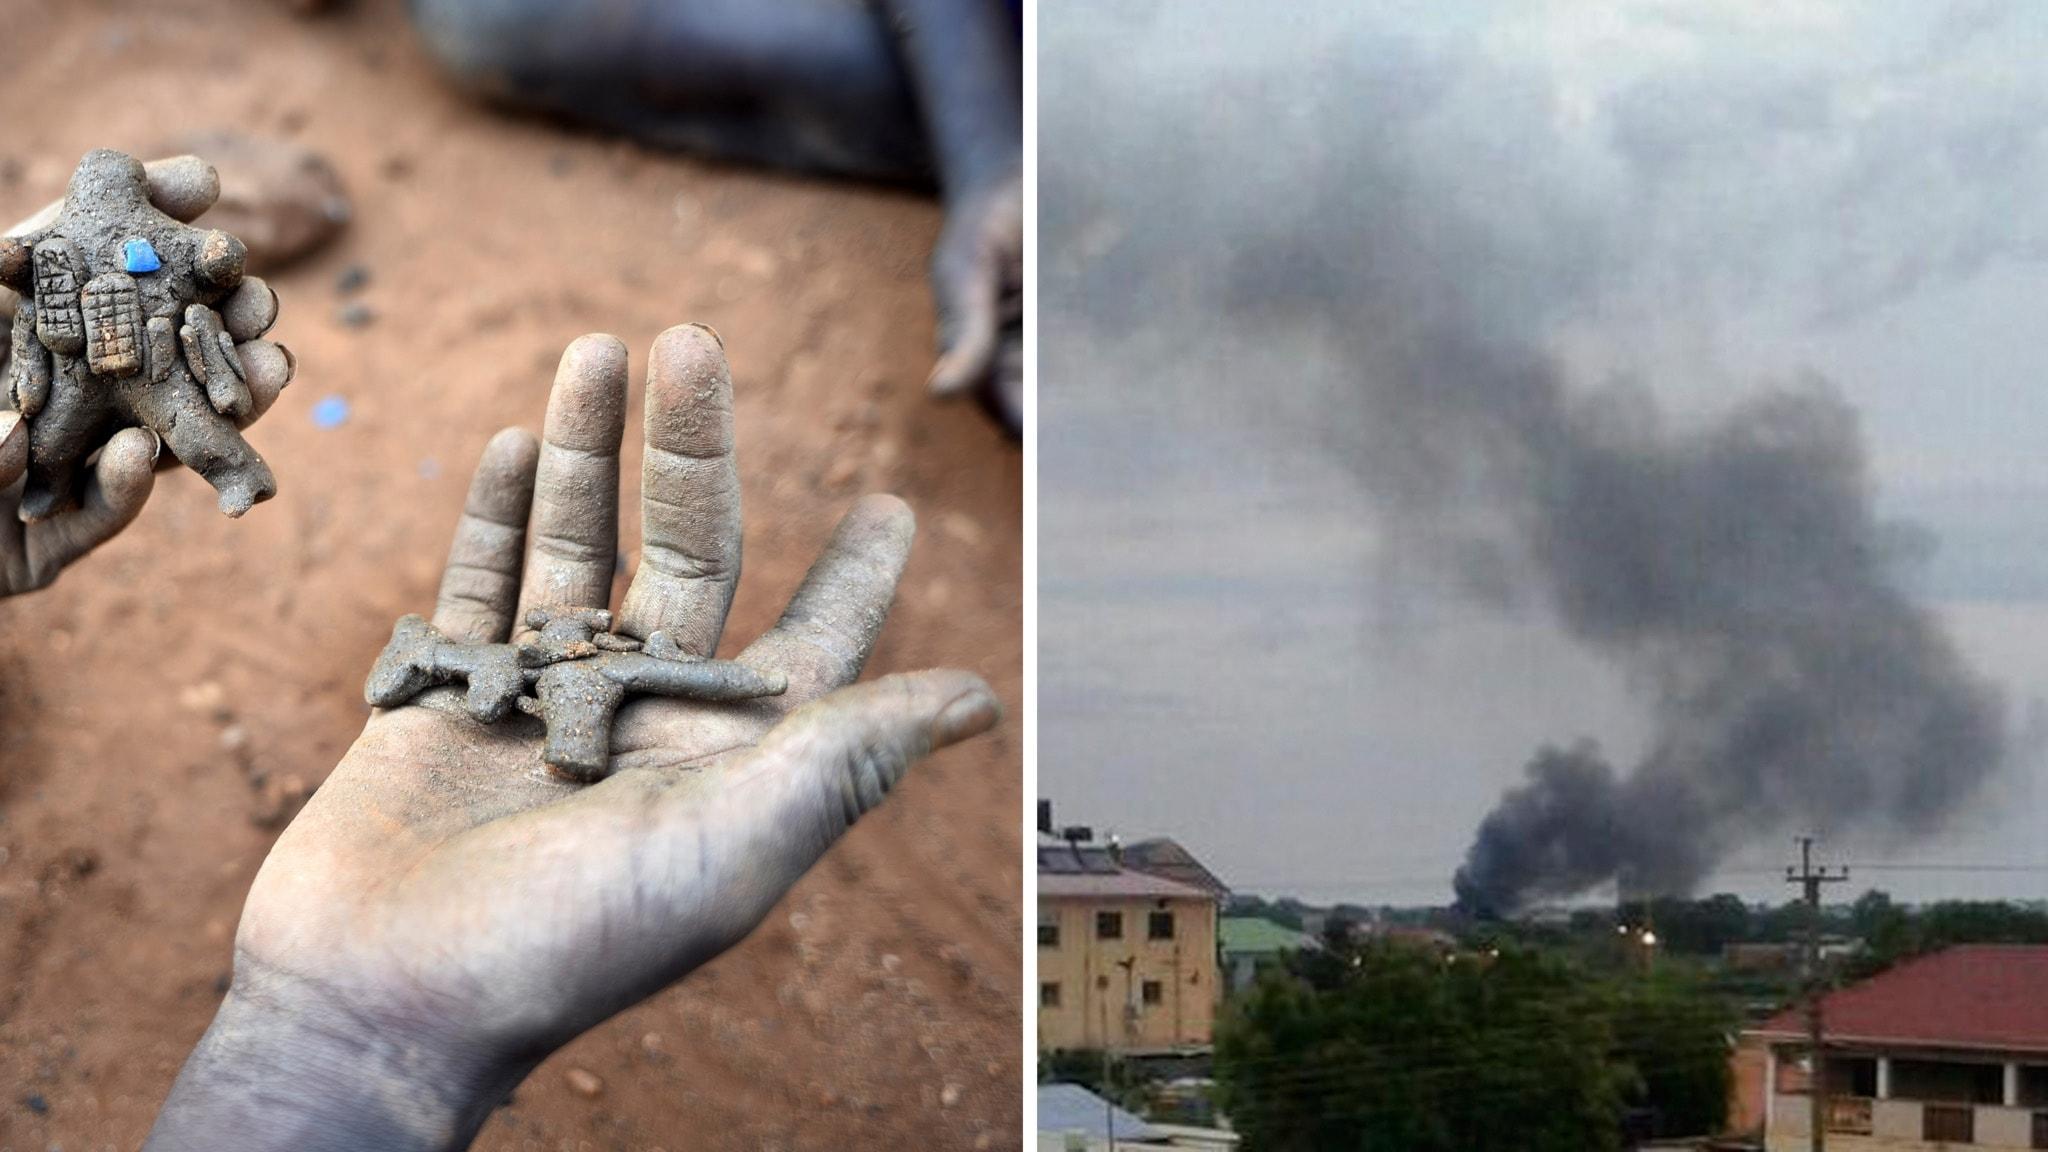 Fn personal skots ihjal i sudan